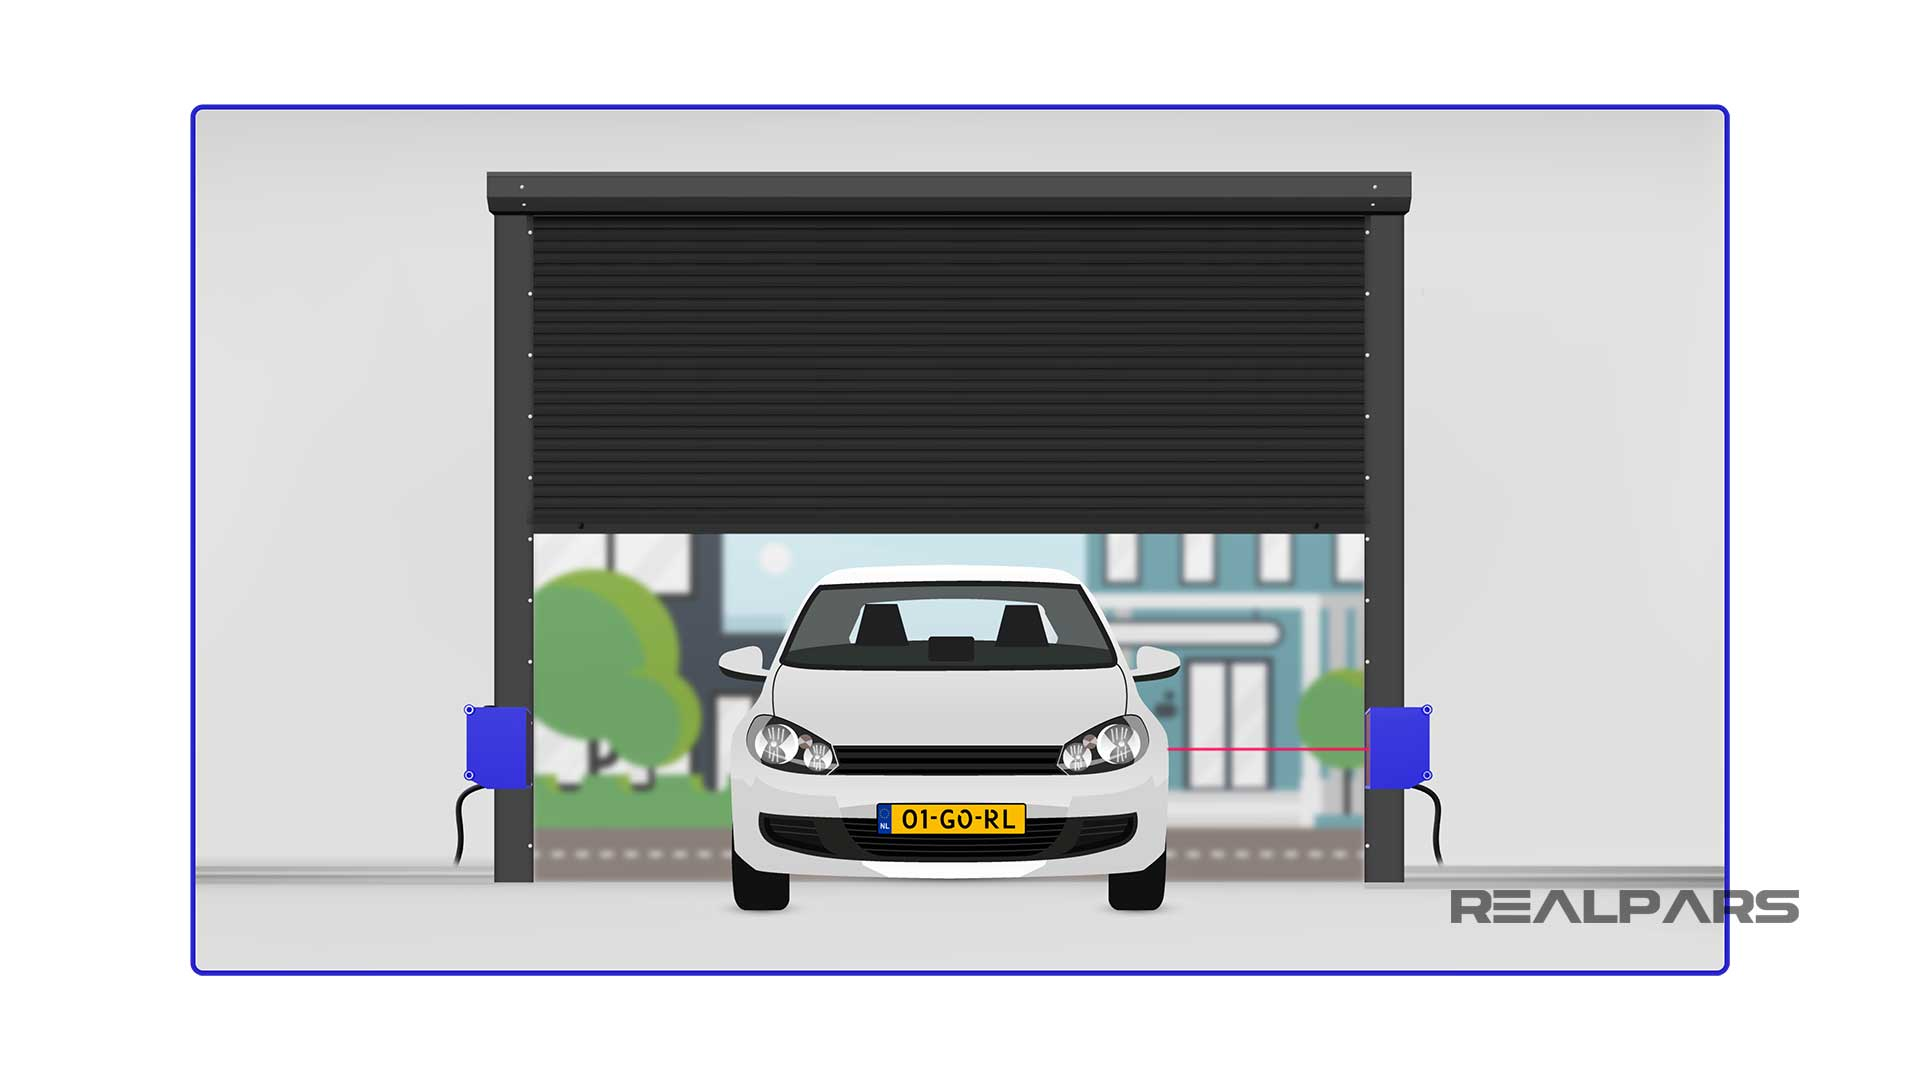 Photoelectric-Sensor-automatic-closing-door-application